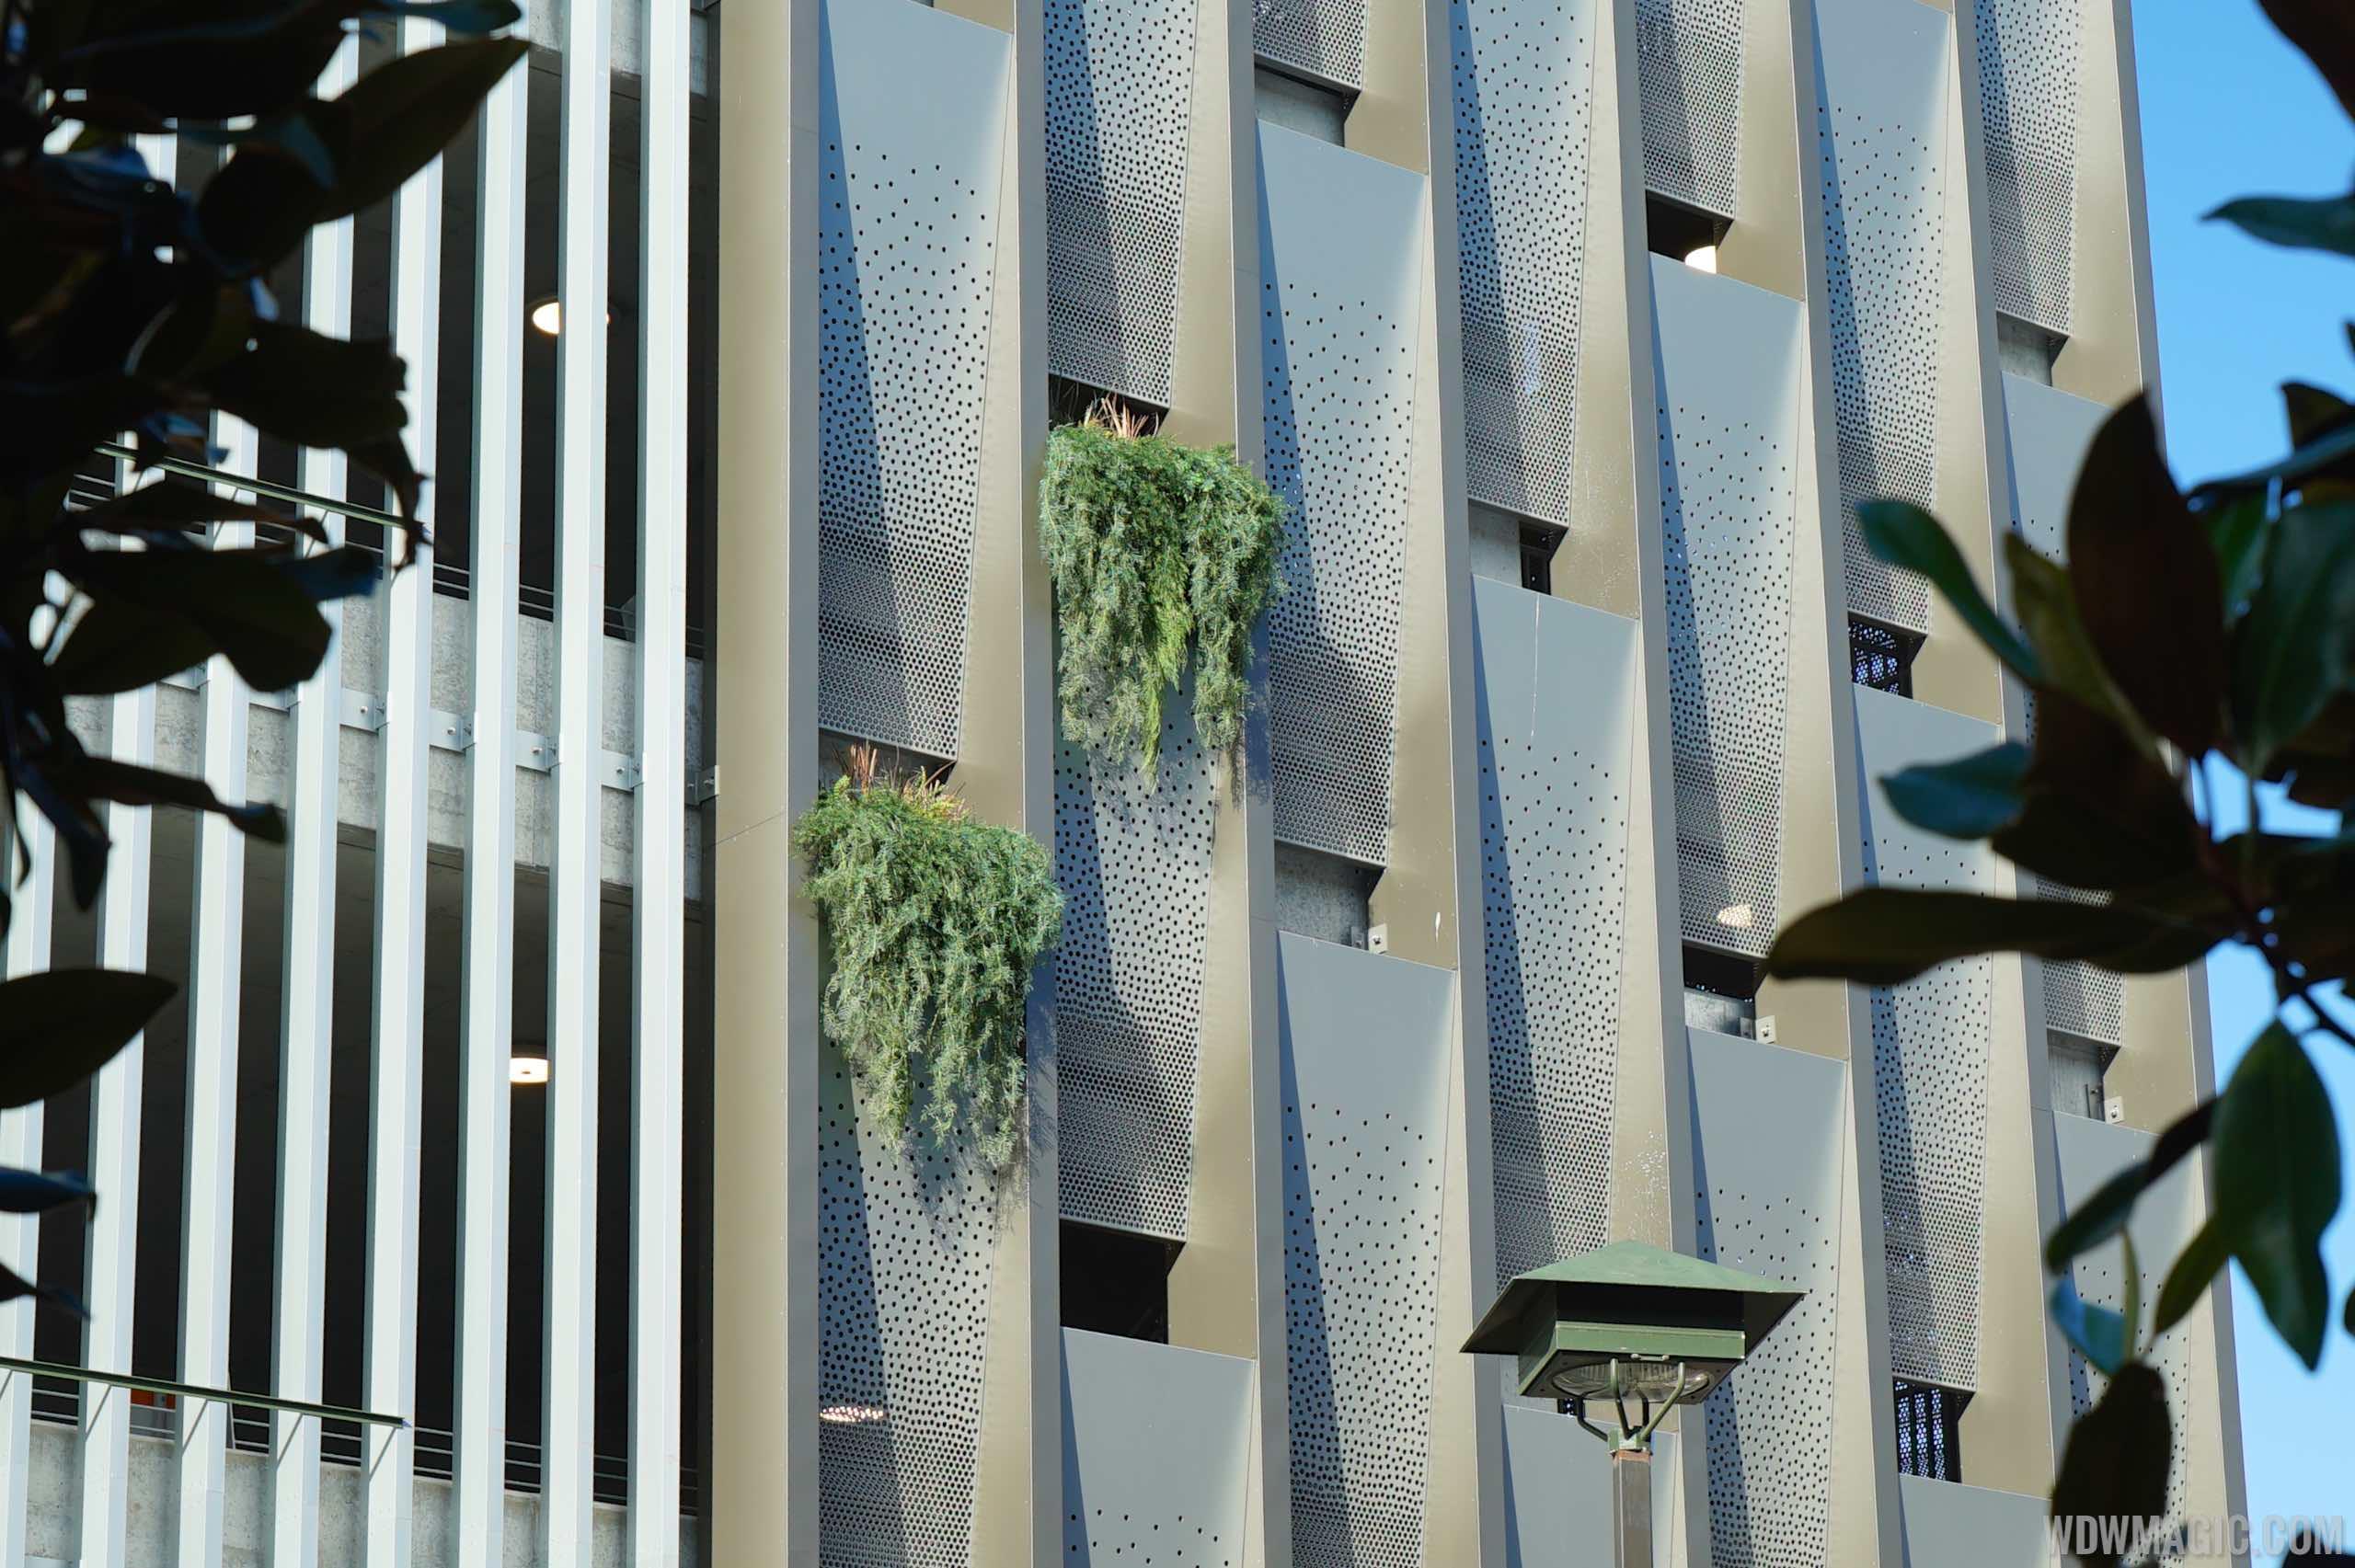 Disney Springs parking garage planters